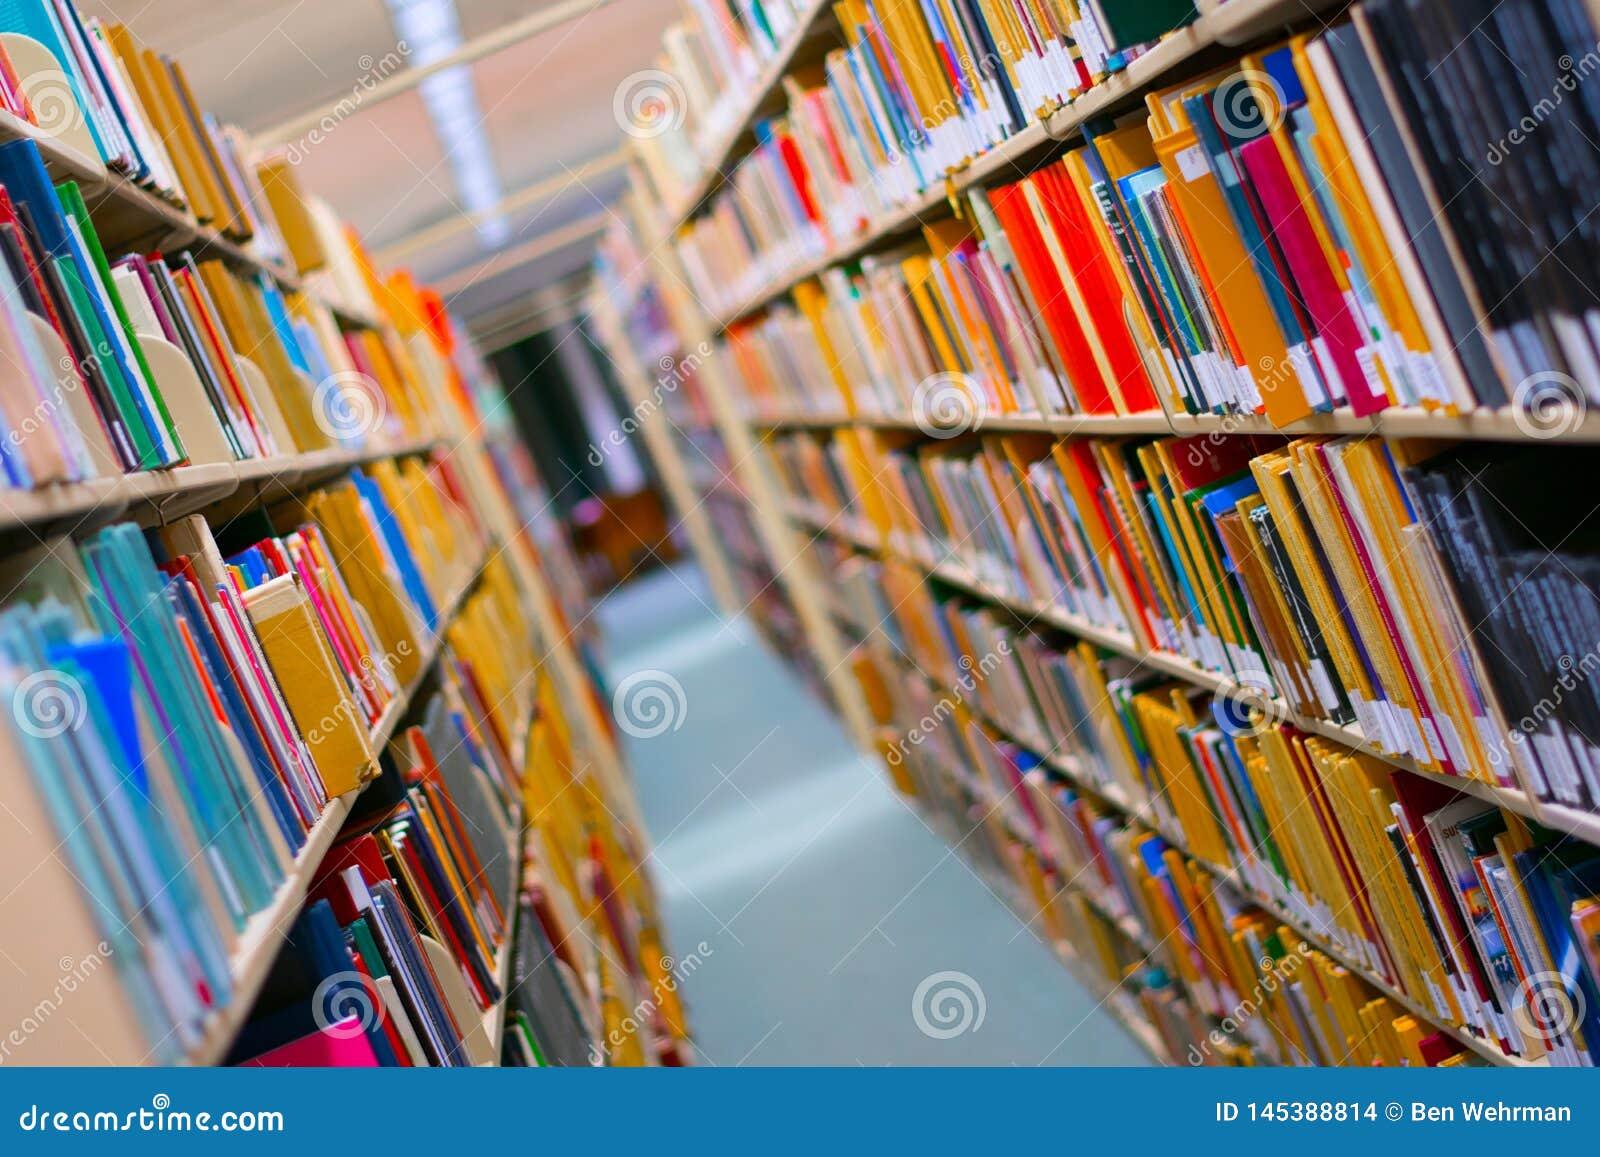 ?tag?re dans une biblioth?que